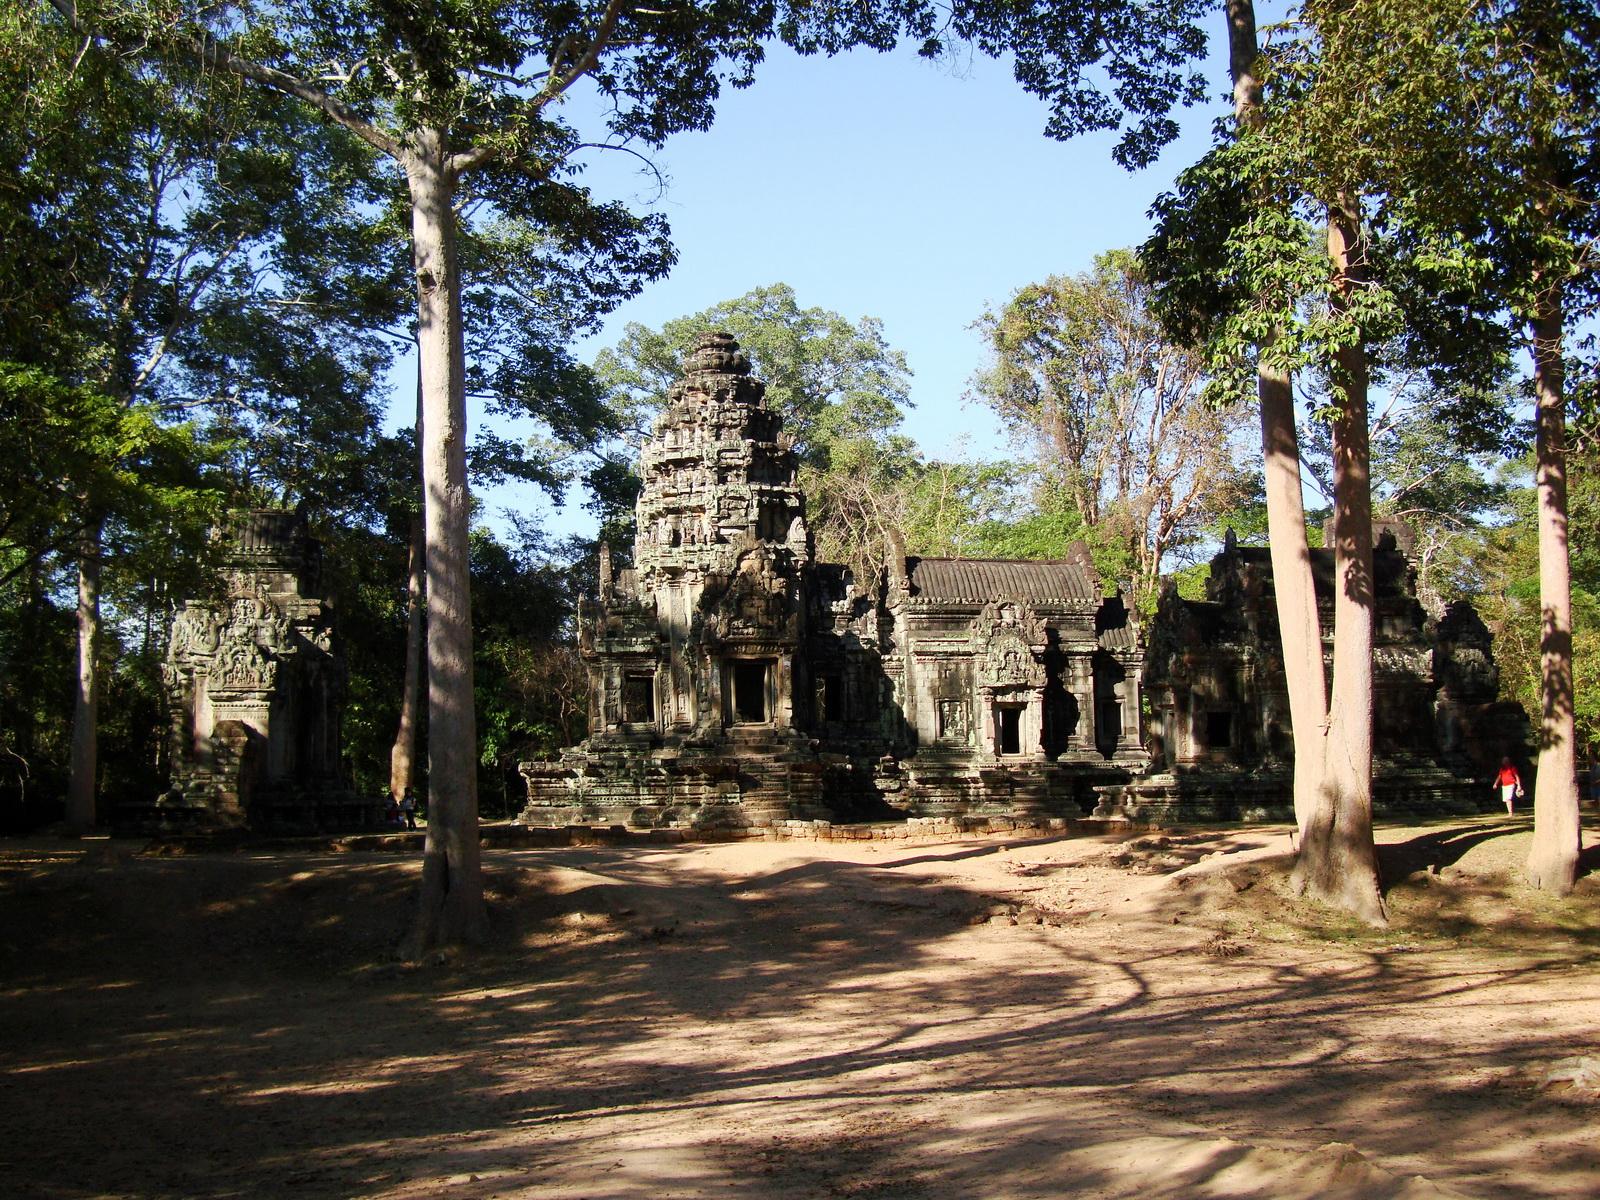 Tamanon Temple Angkor Siem Reap Cambodia Jan 2010 01